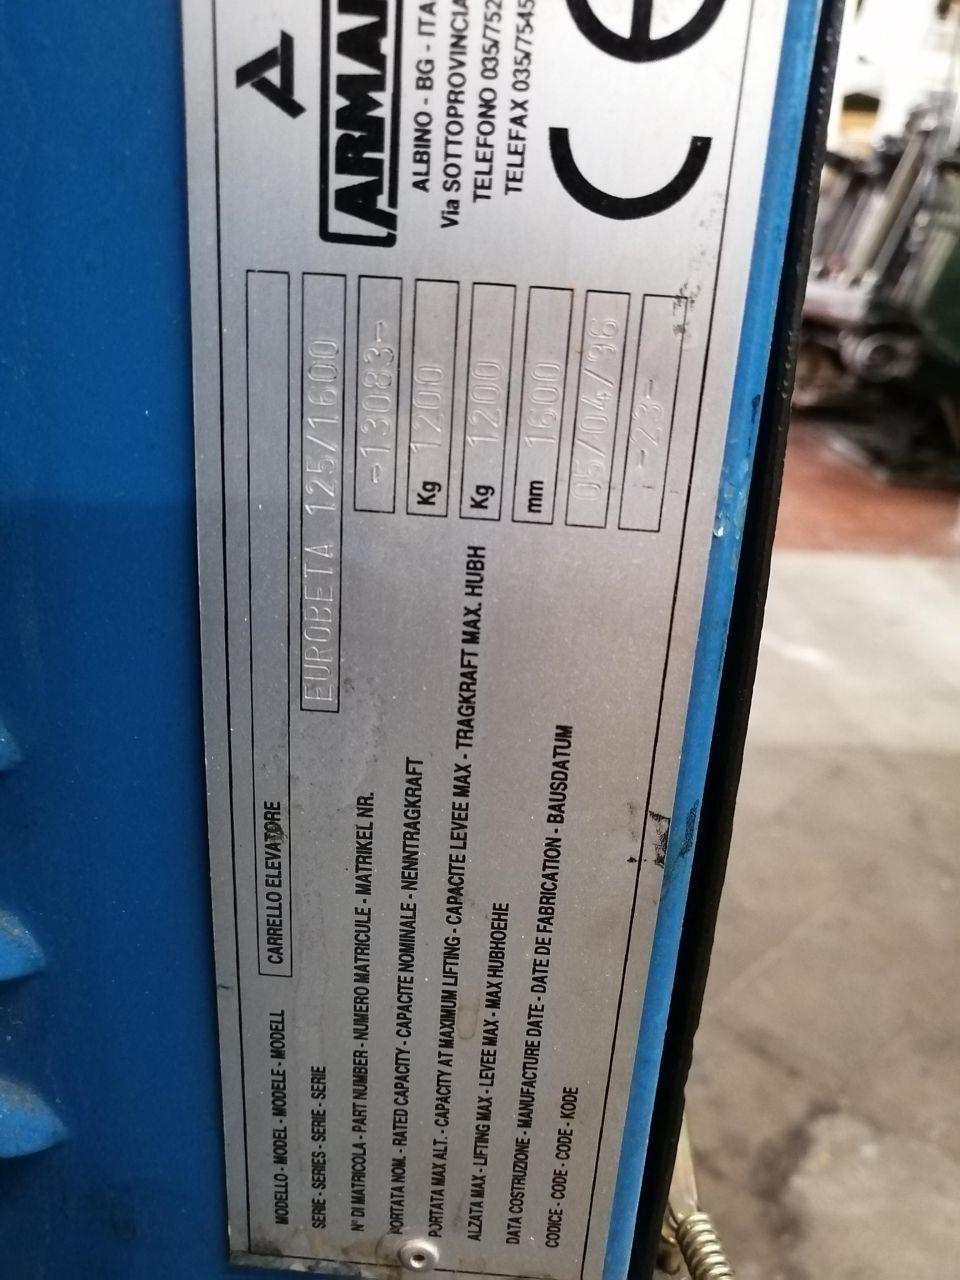 HANDLING-MATERIAL ELECTRIC PALLET TRUCK, Year : 1996, ref.68334 | www.coci-sa.com/ru | 68334n.jpg